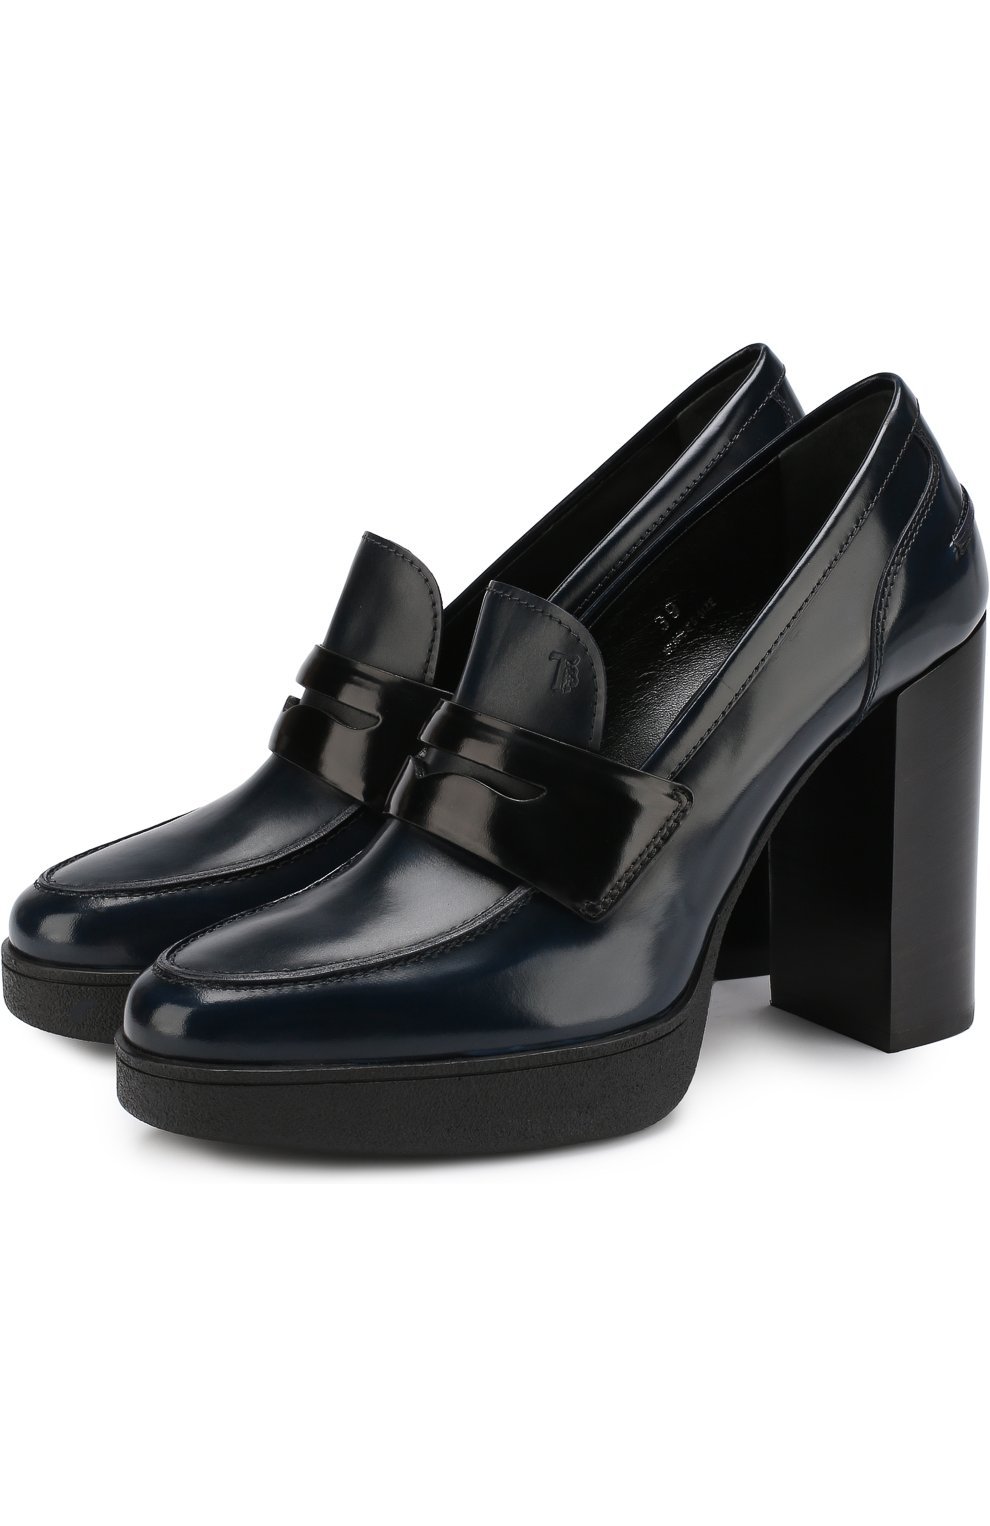 Кожаные туфли на устойчивом каблуке и платформе | Фото №1